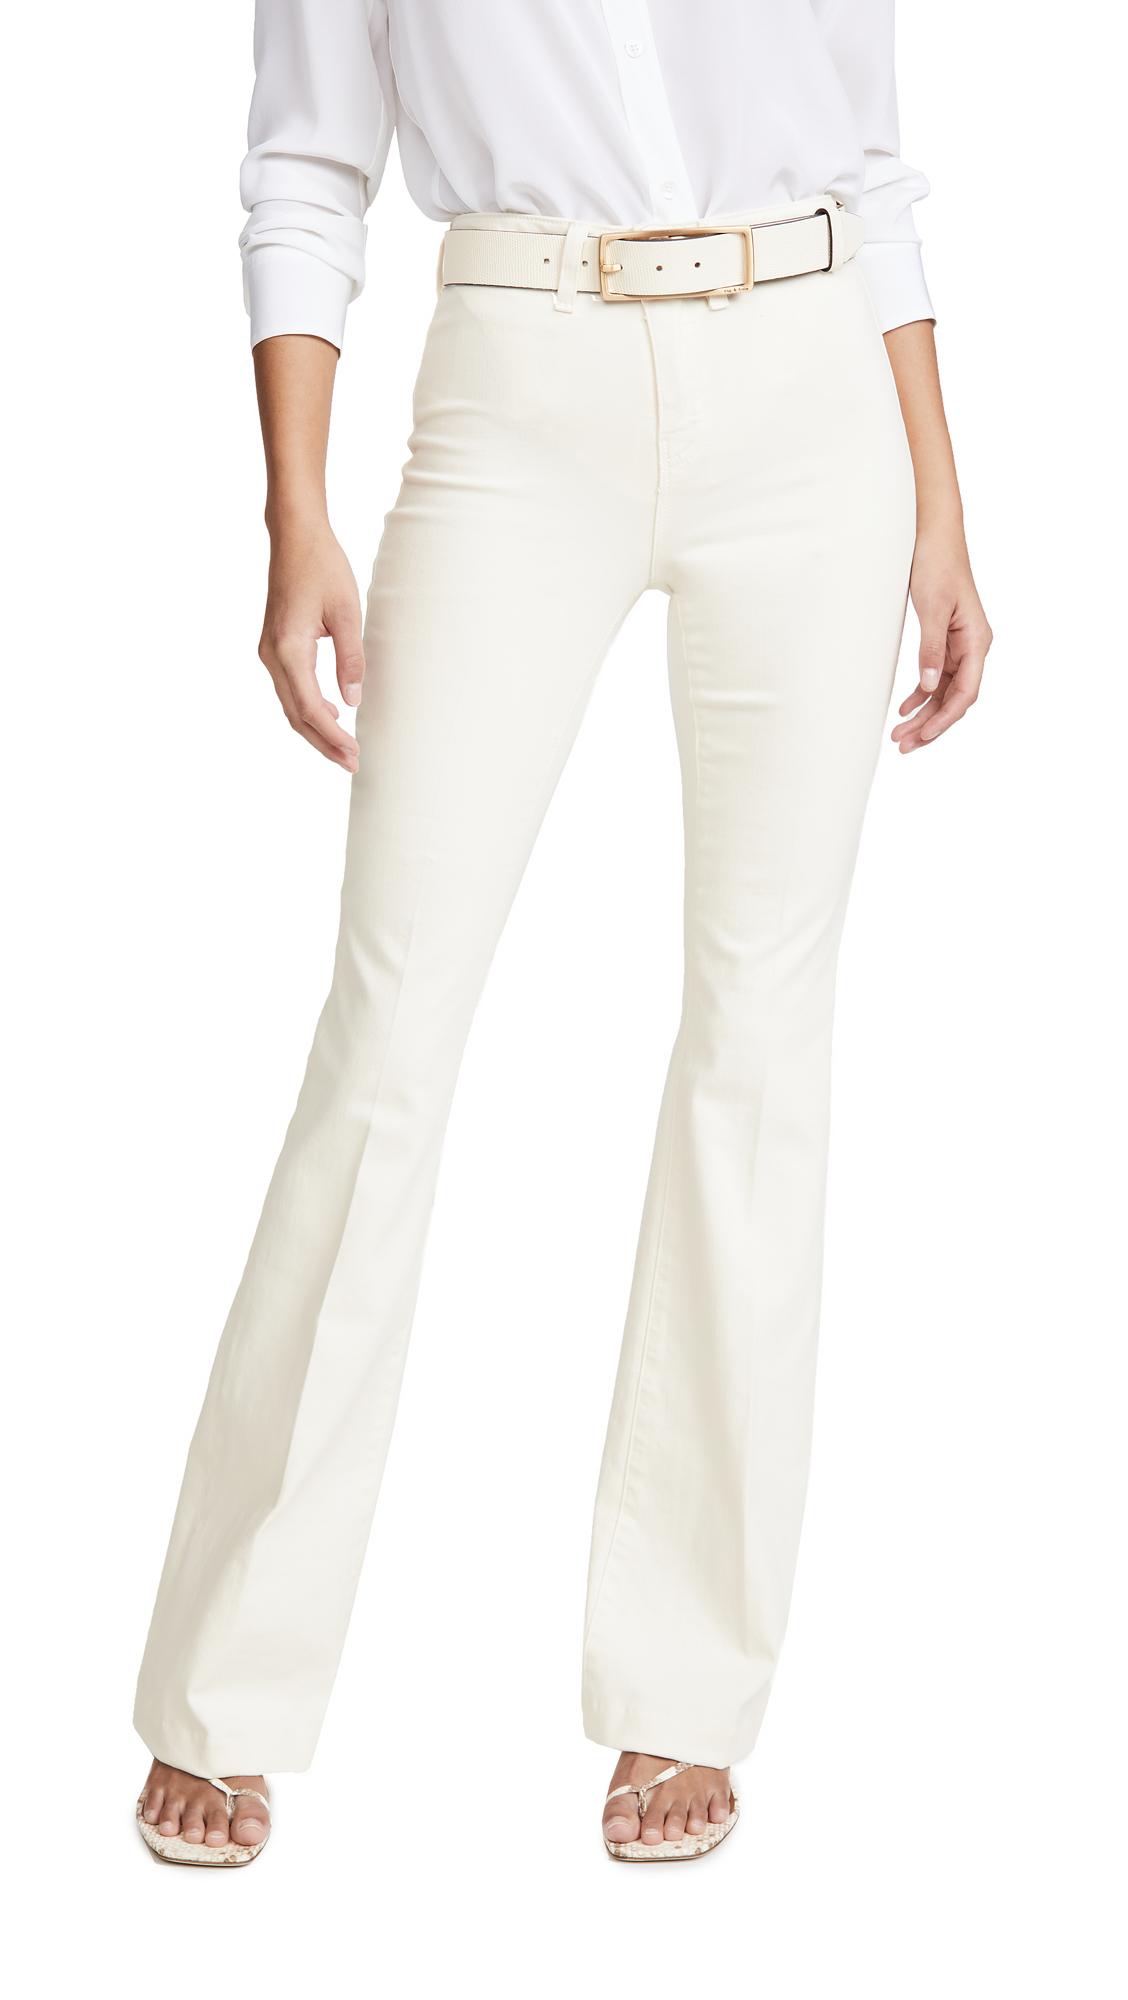 L'AGENCE Joplin High Rise Flare Jeans